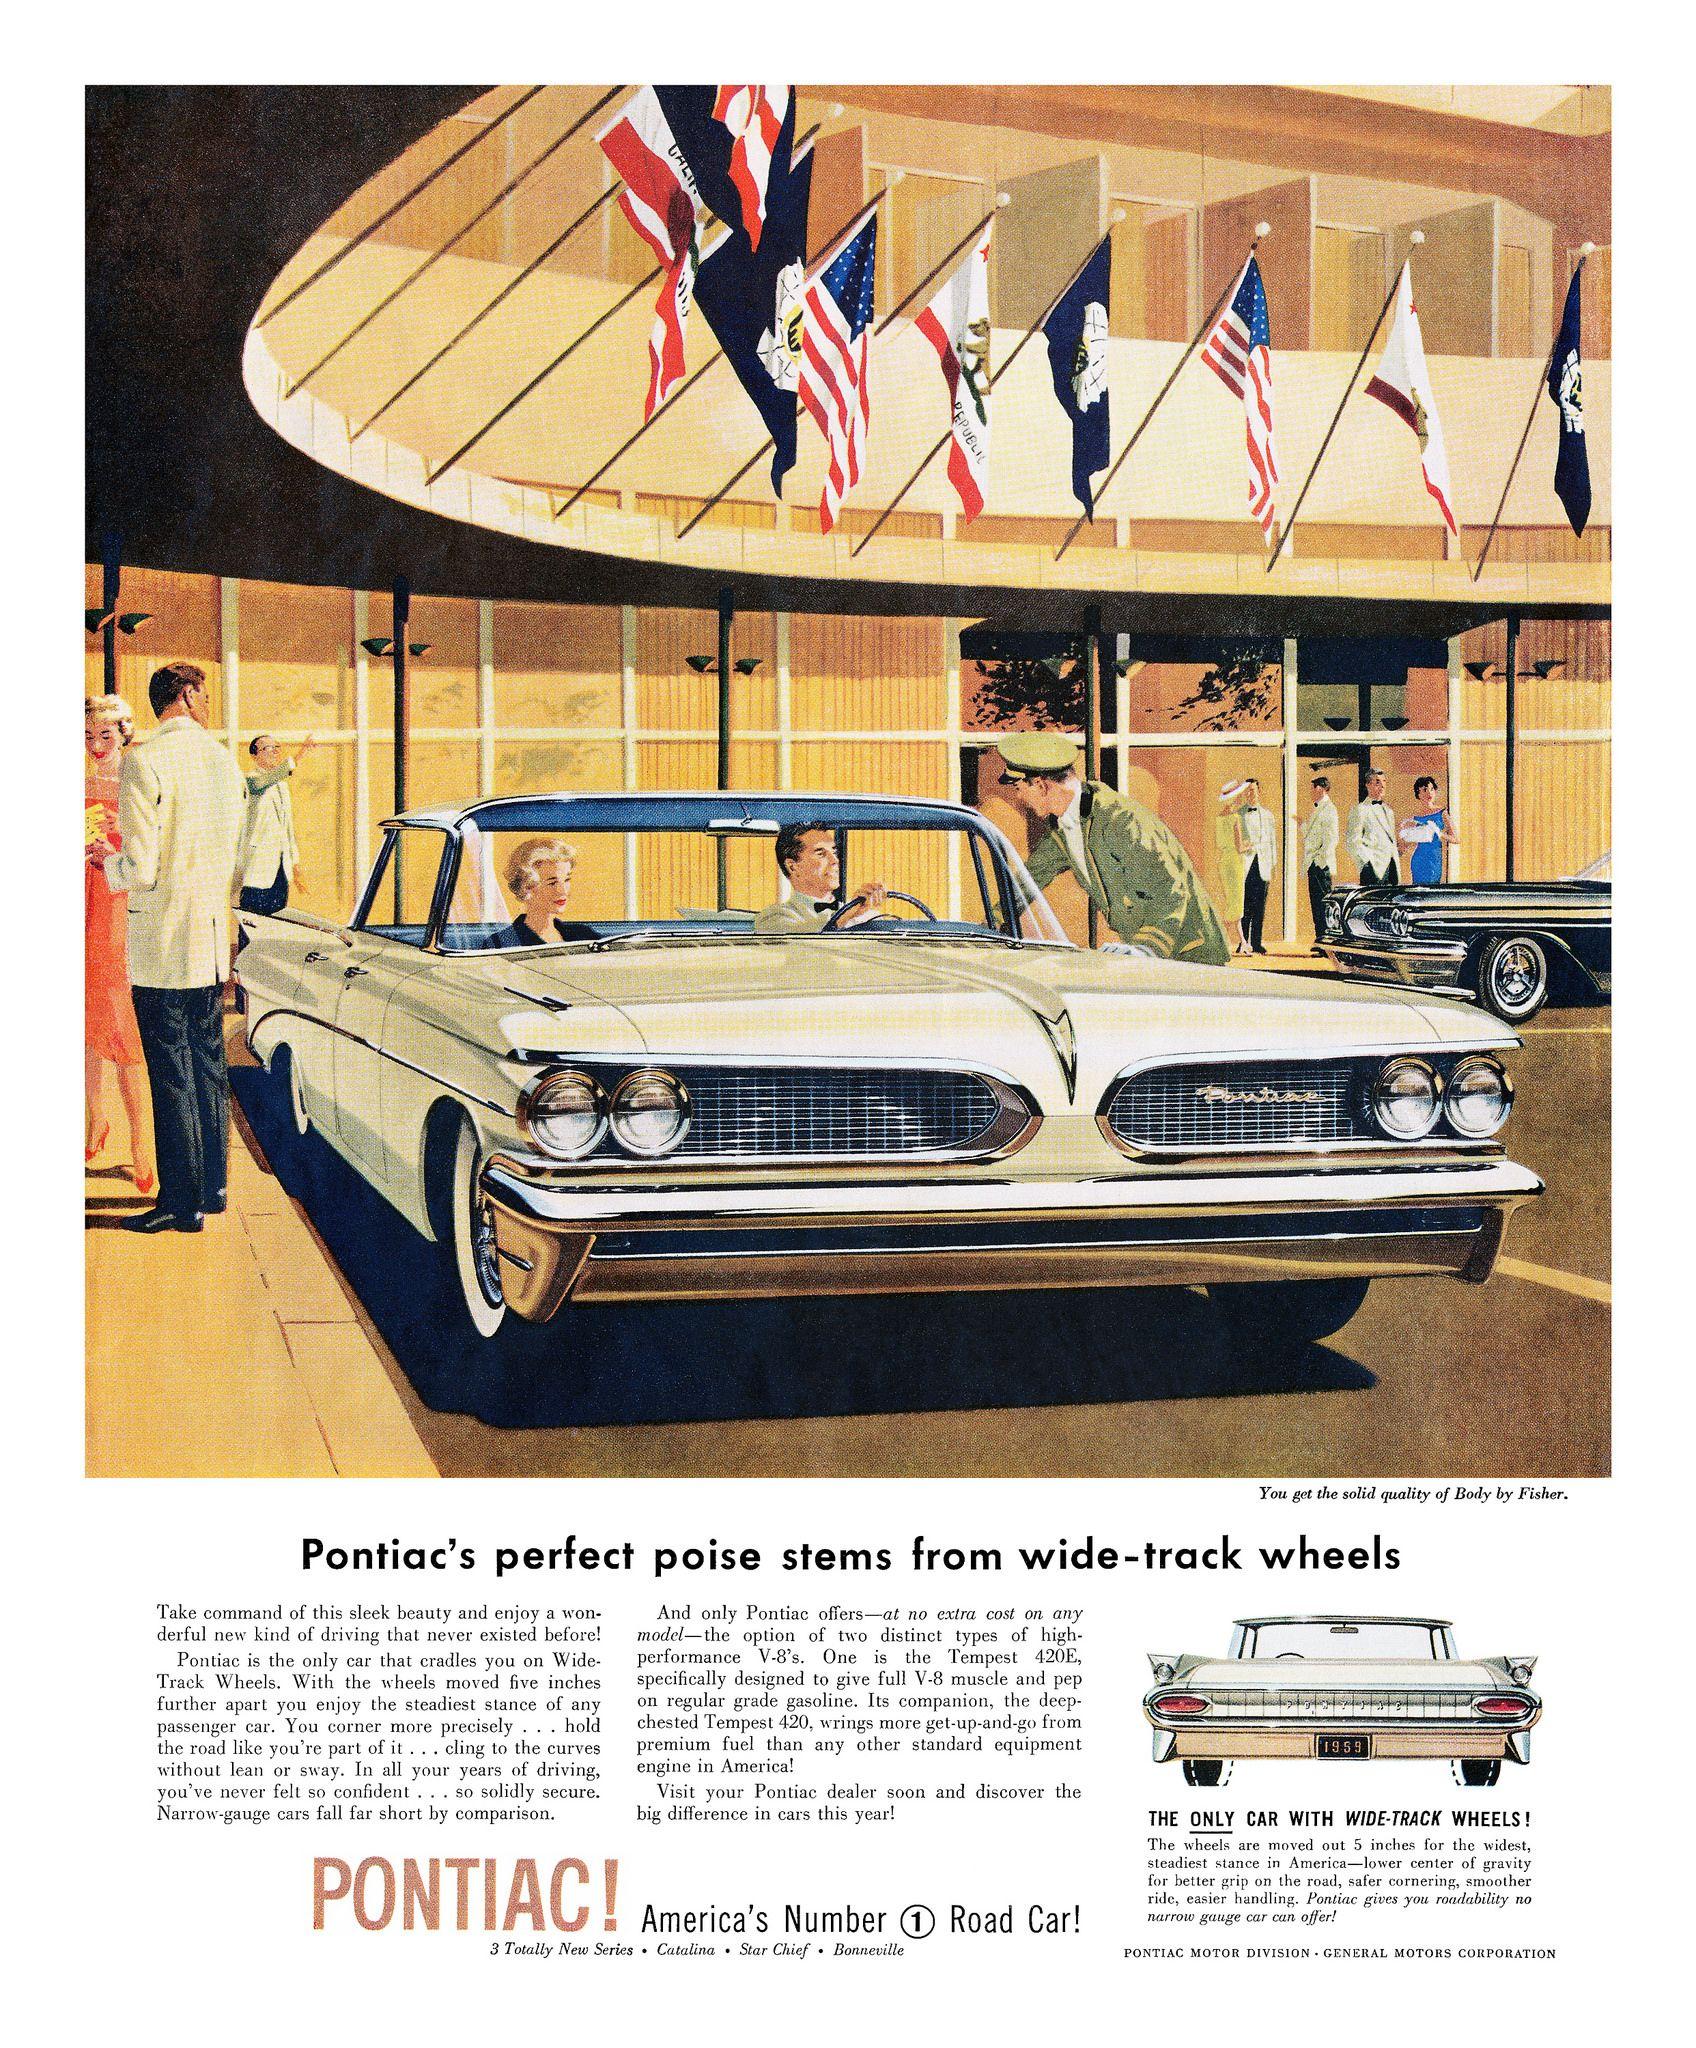 Vintage Pontiac Dealership: PONTIAC: THE WIDE-TRACK YEARS